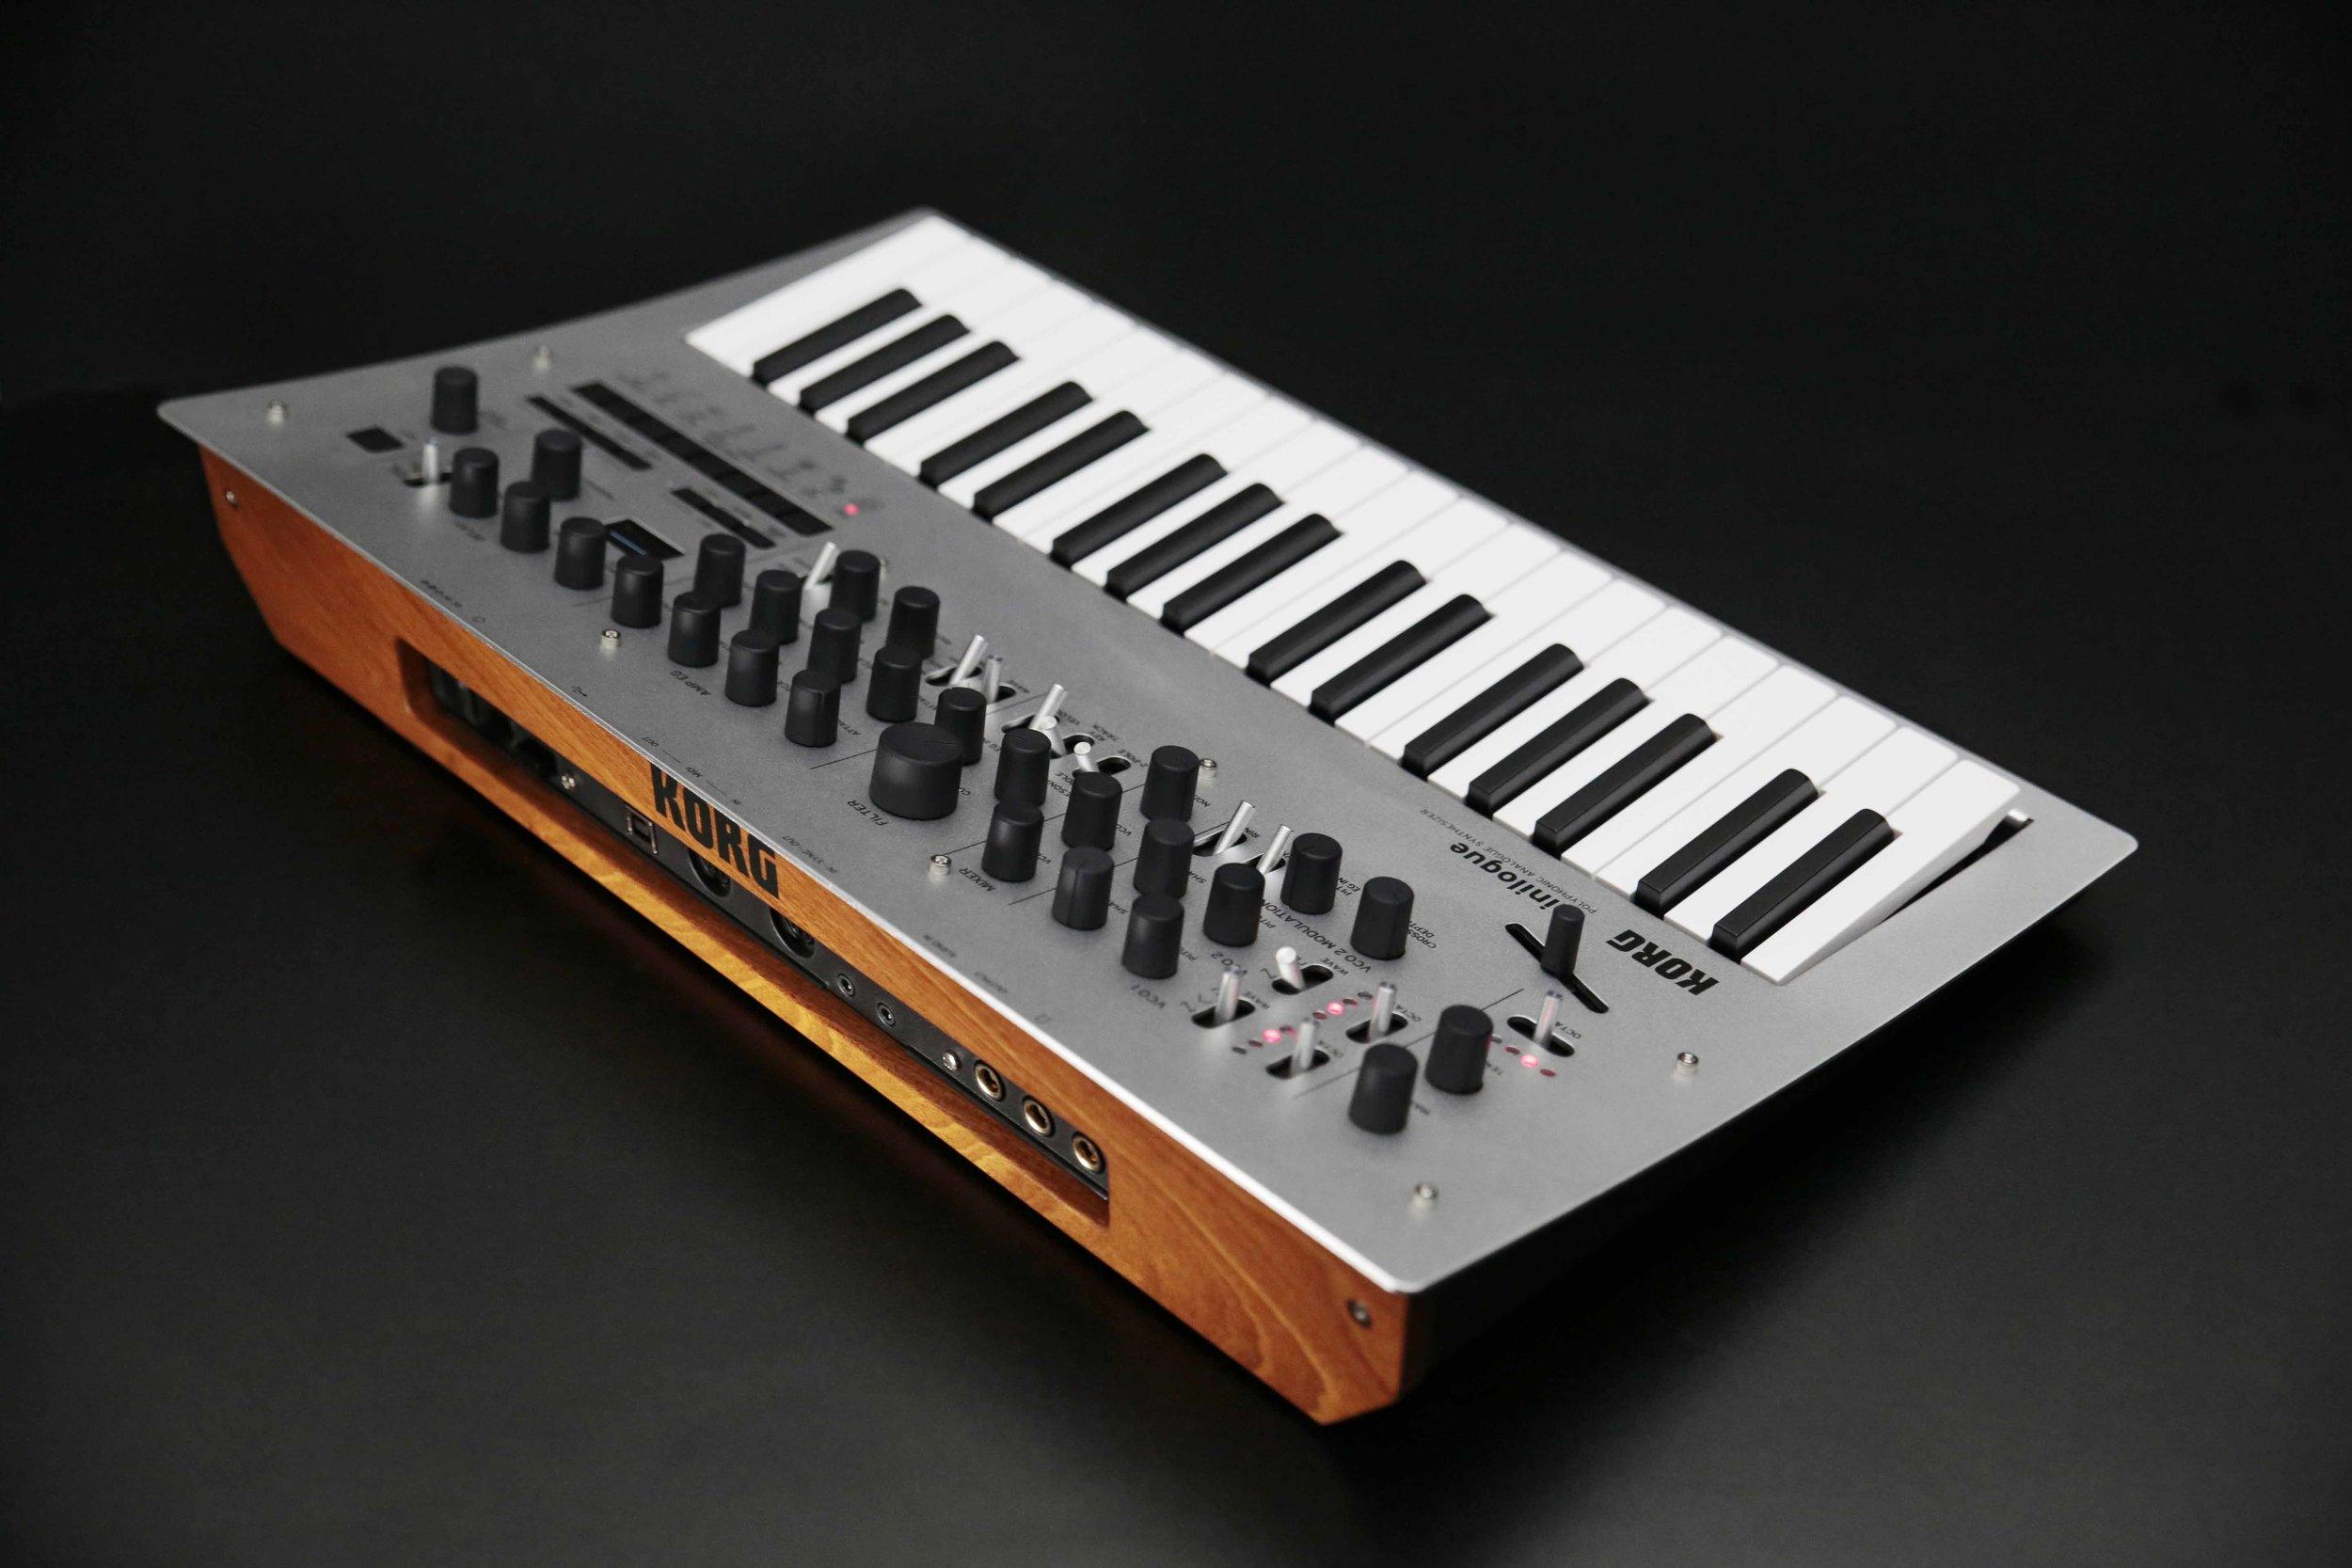 First Prize - a Korg Minilogue Polyphonic Analogue Synthesizer.